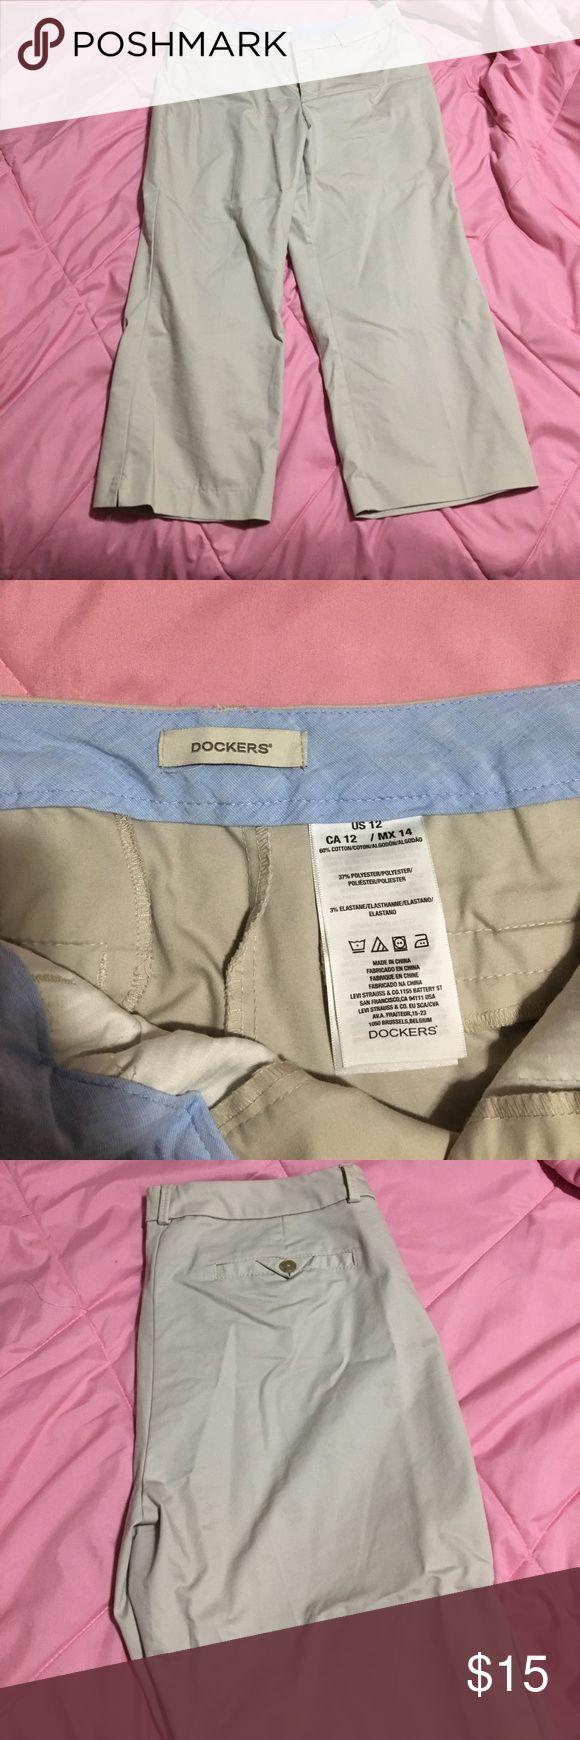 Dockers khaki Capri dress pants Dockers women's size 12. Khaki Capri pants. Dockers Pants Capris